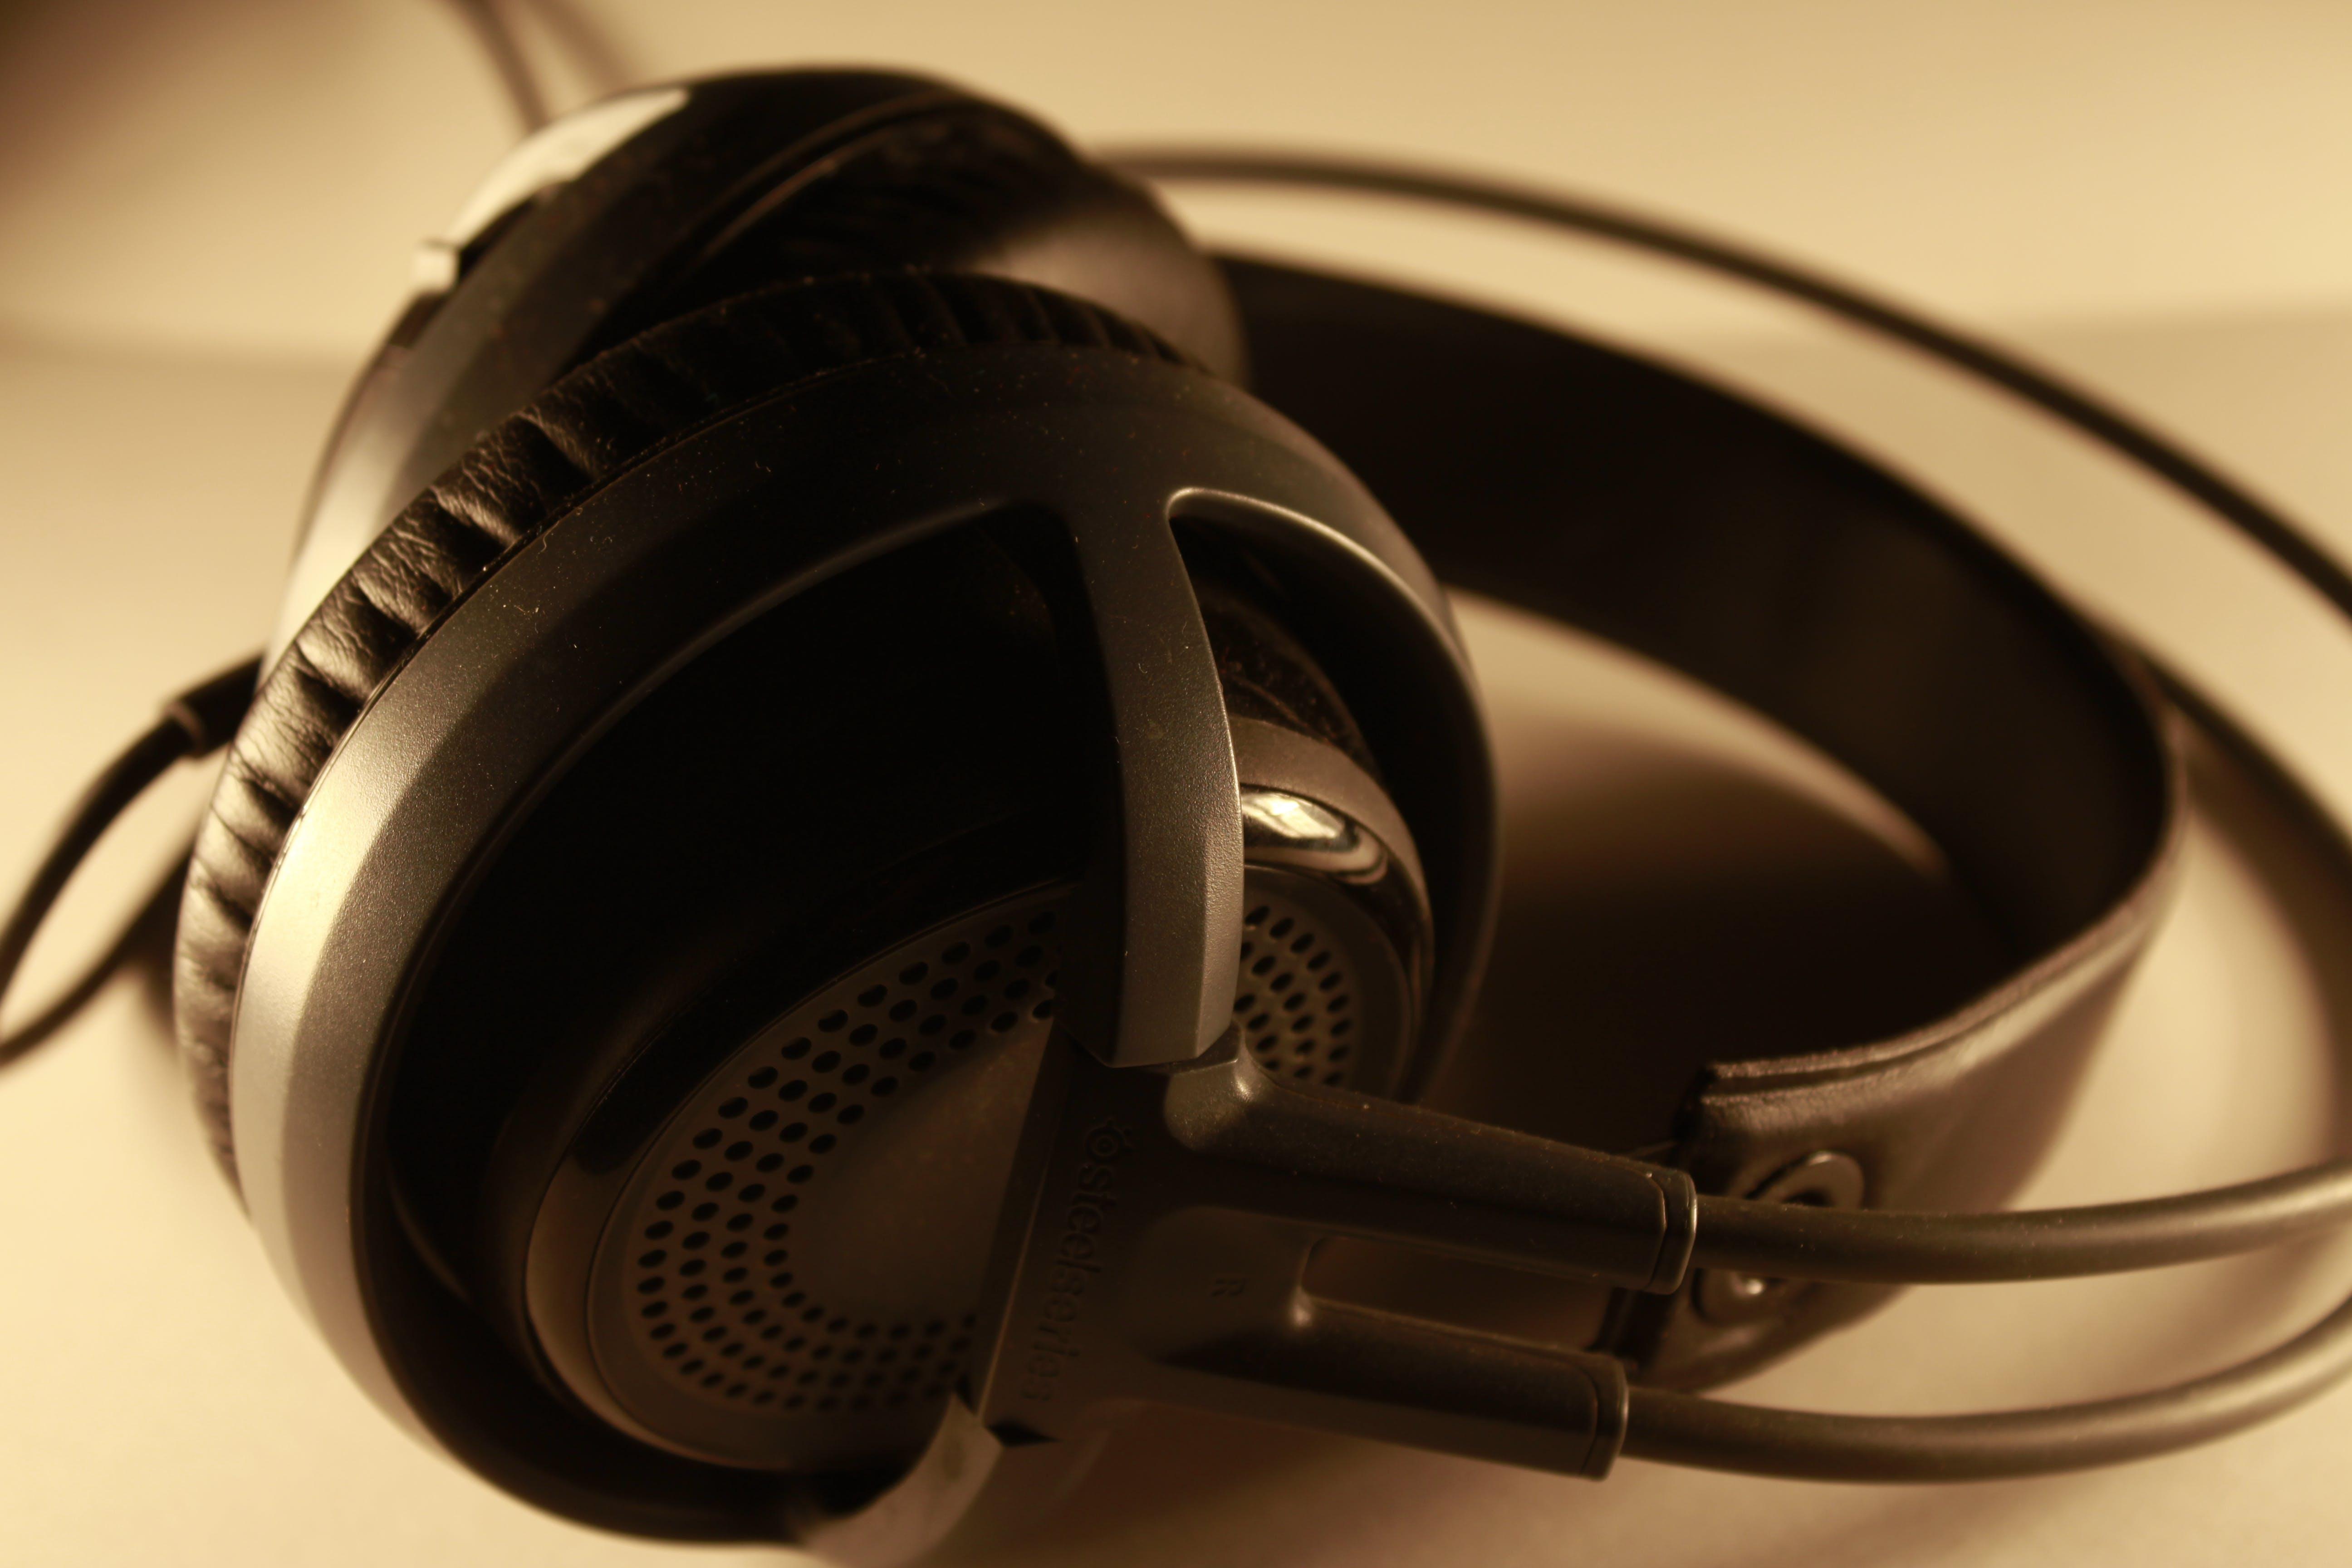 Free stock photo of brand, headphones, macro, product